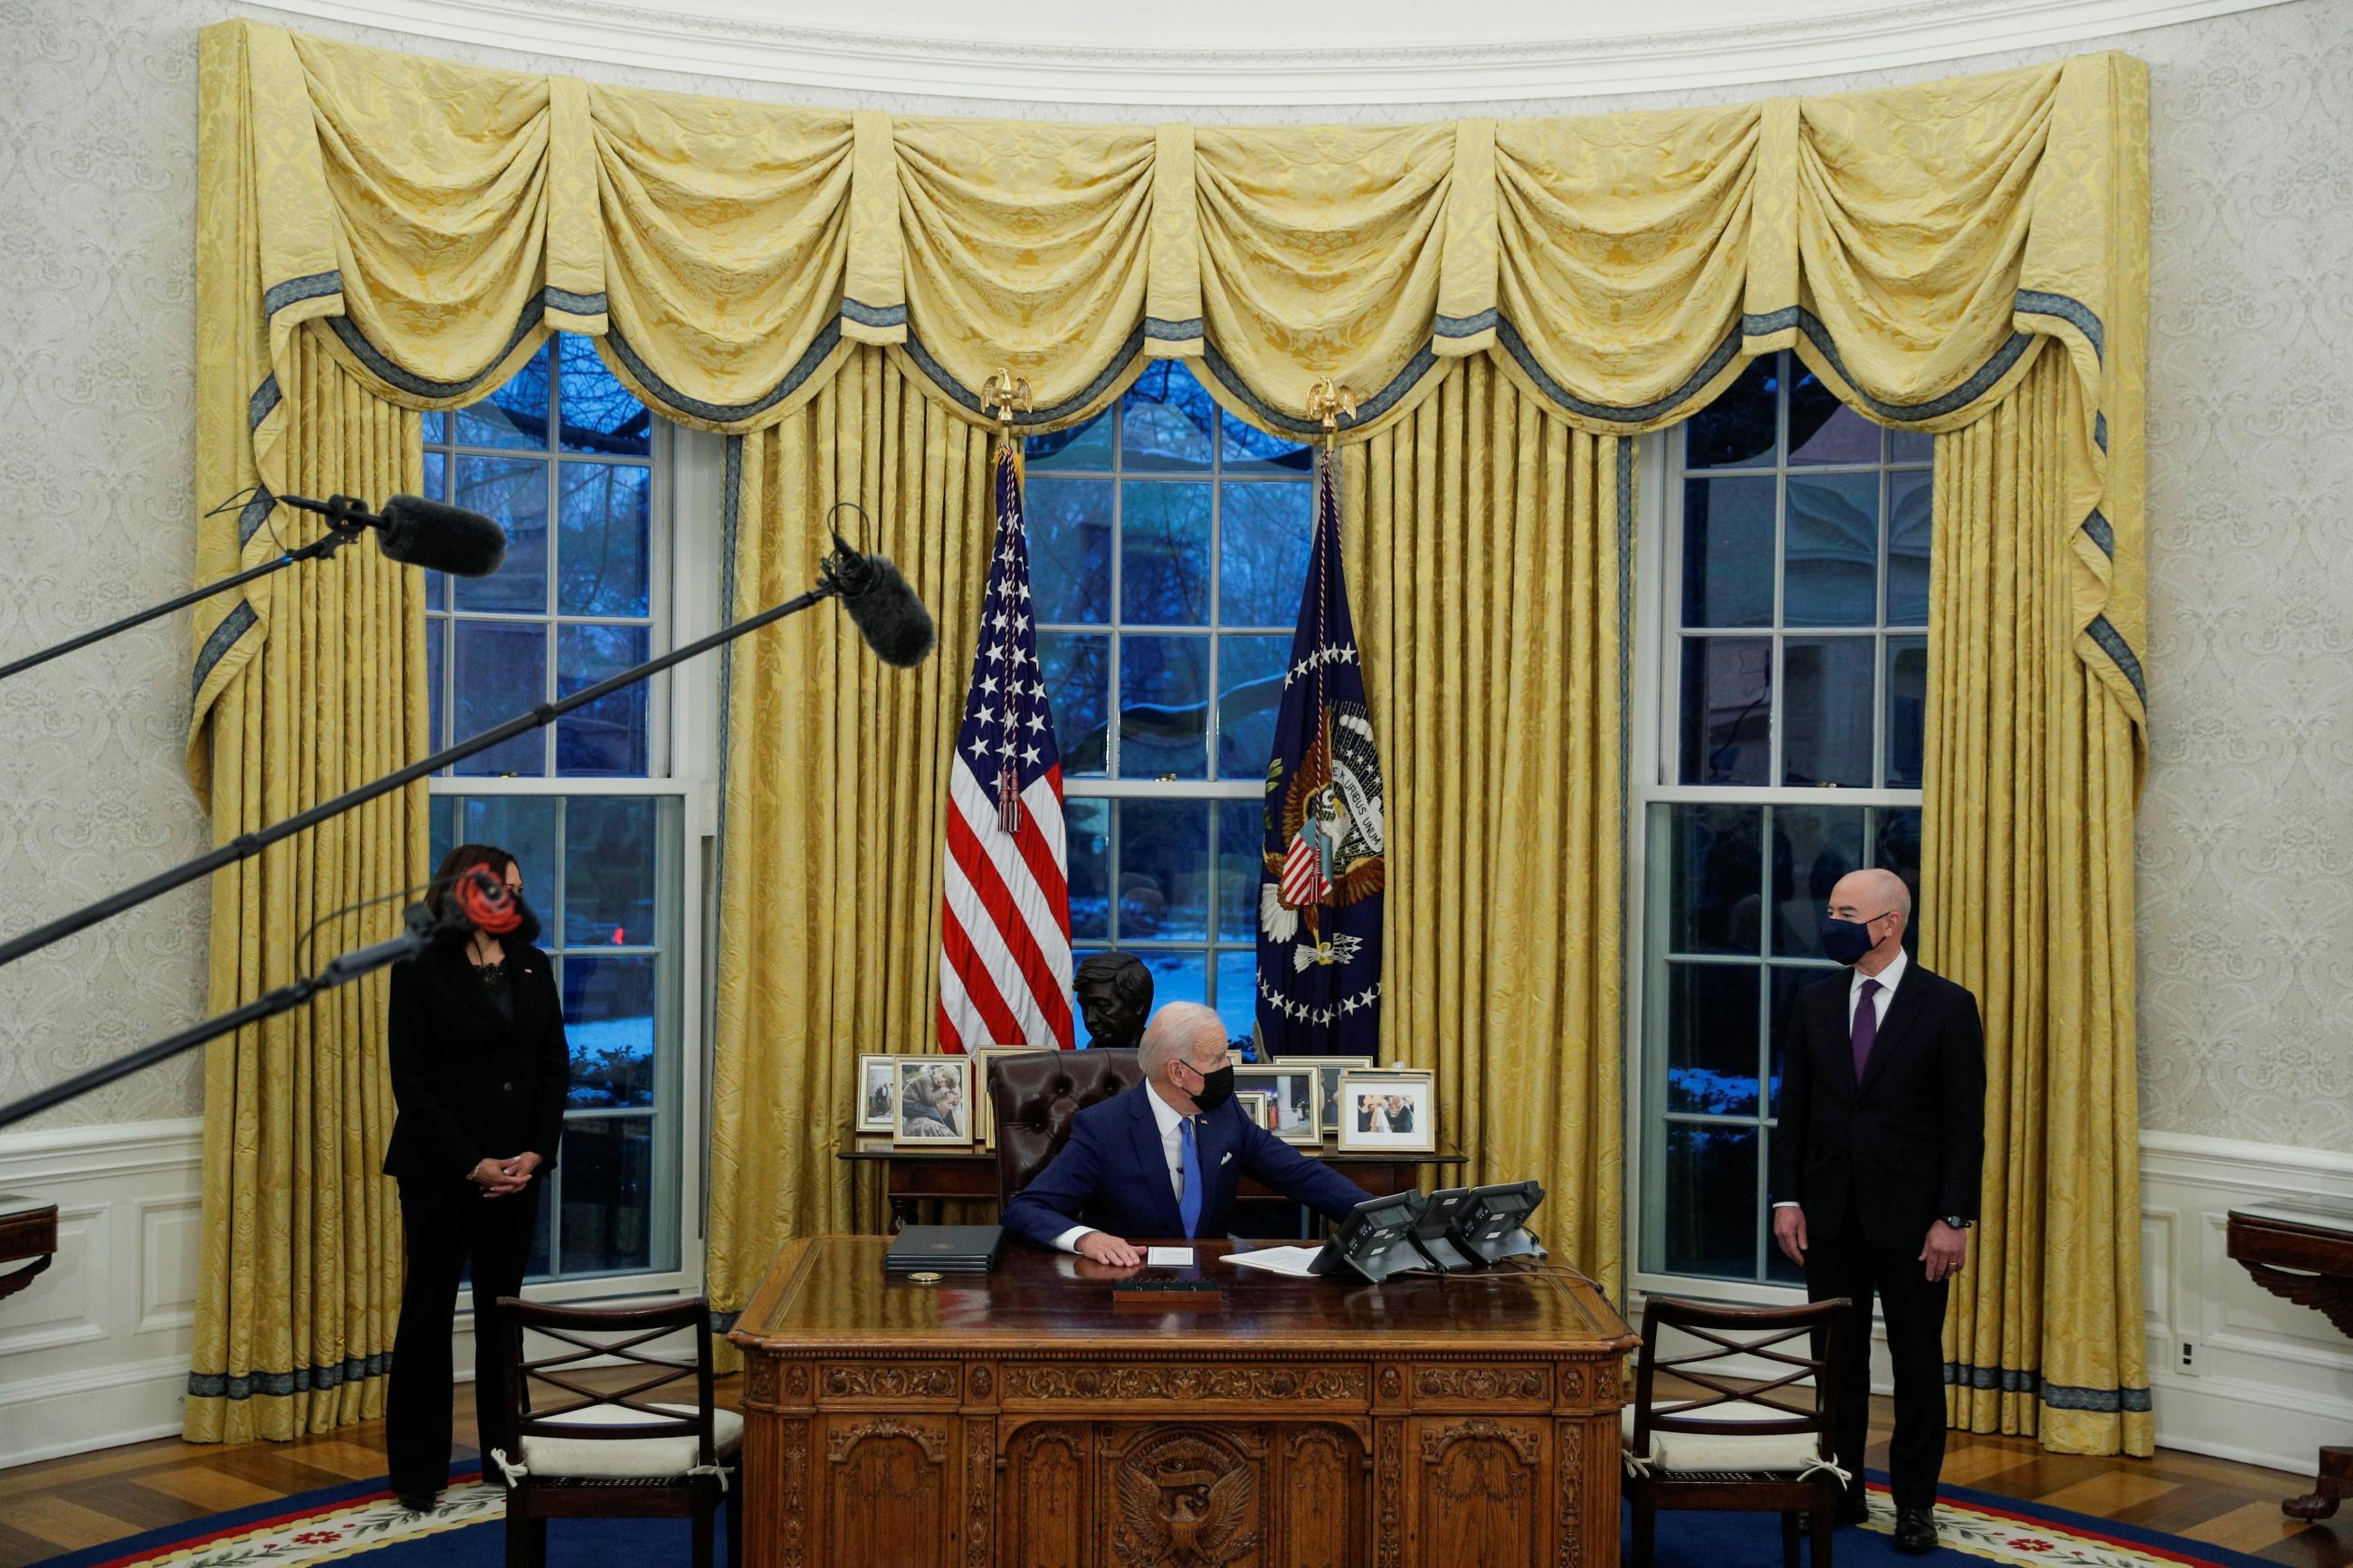 U.S. President Joe Biden looks on as he prepares to sign executive orders at the White House in Washington, U.S., February 2, 2021.